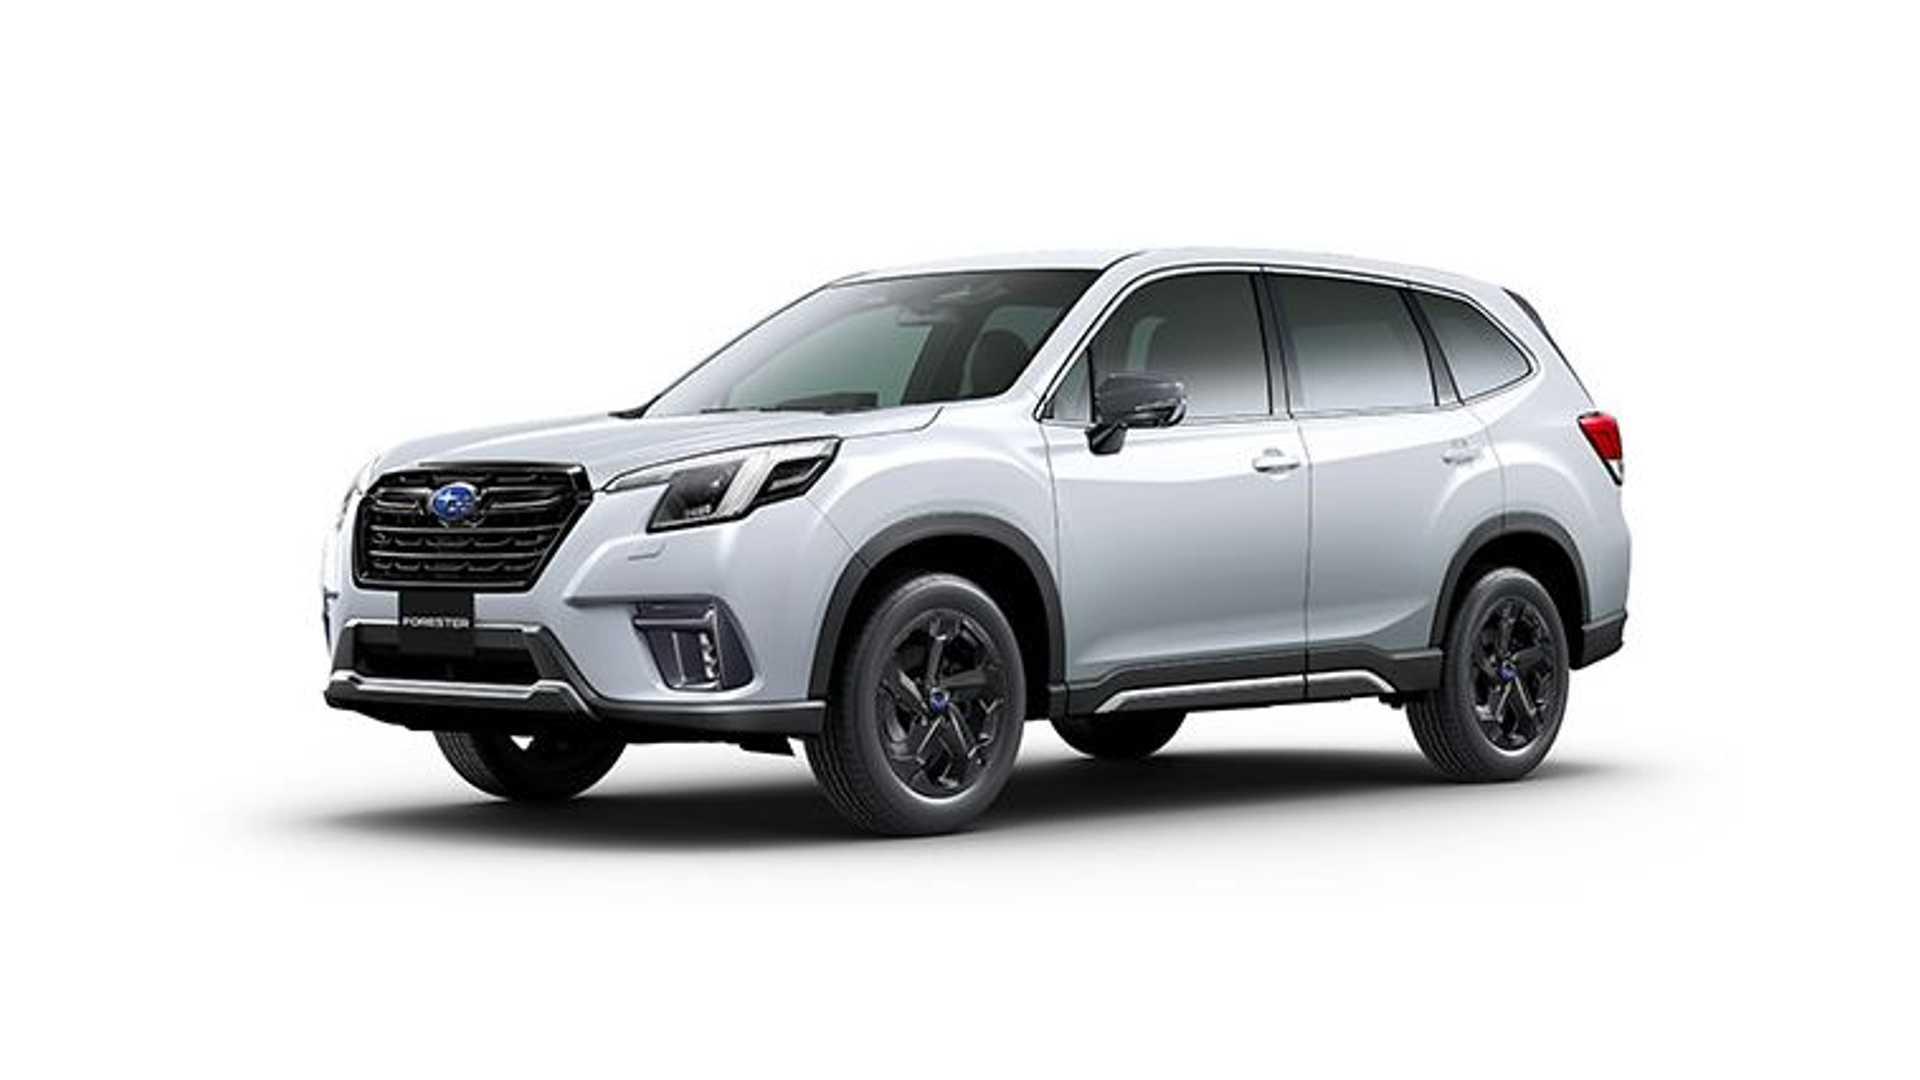 Subaru-Forester-facelift-10